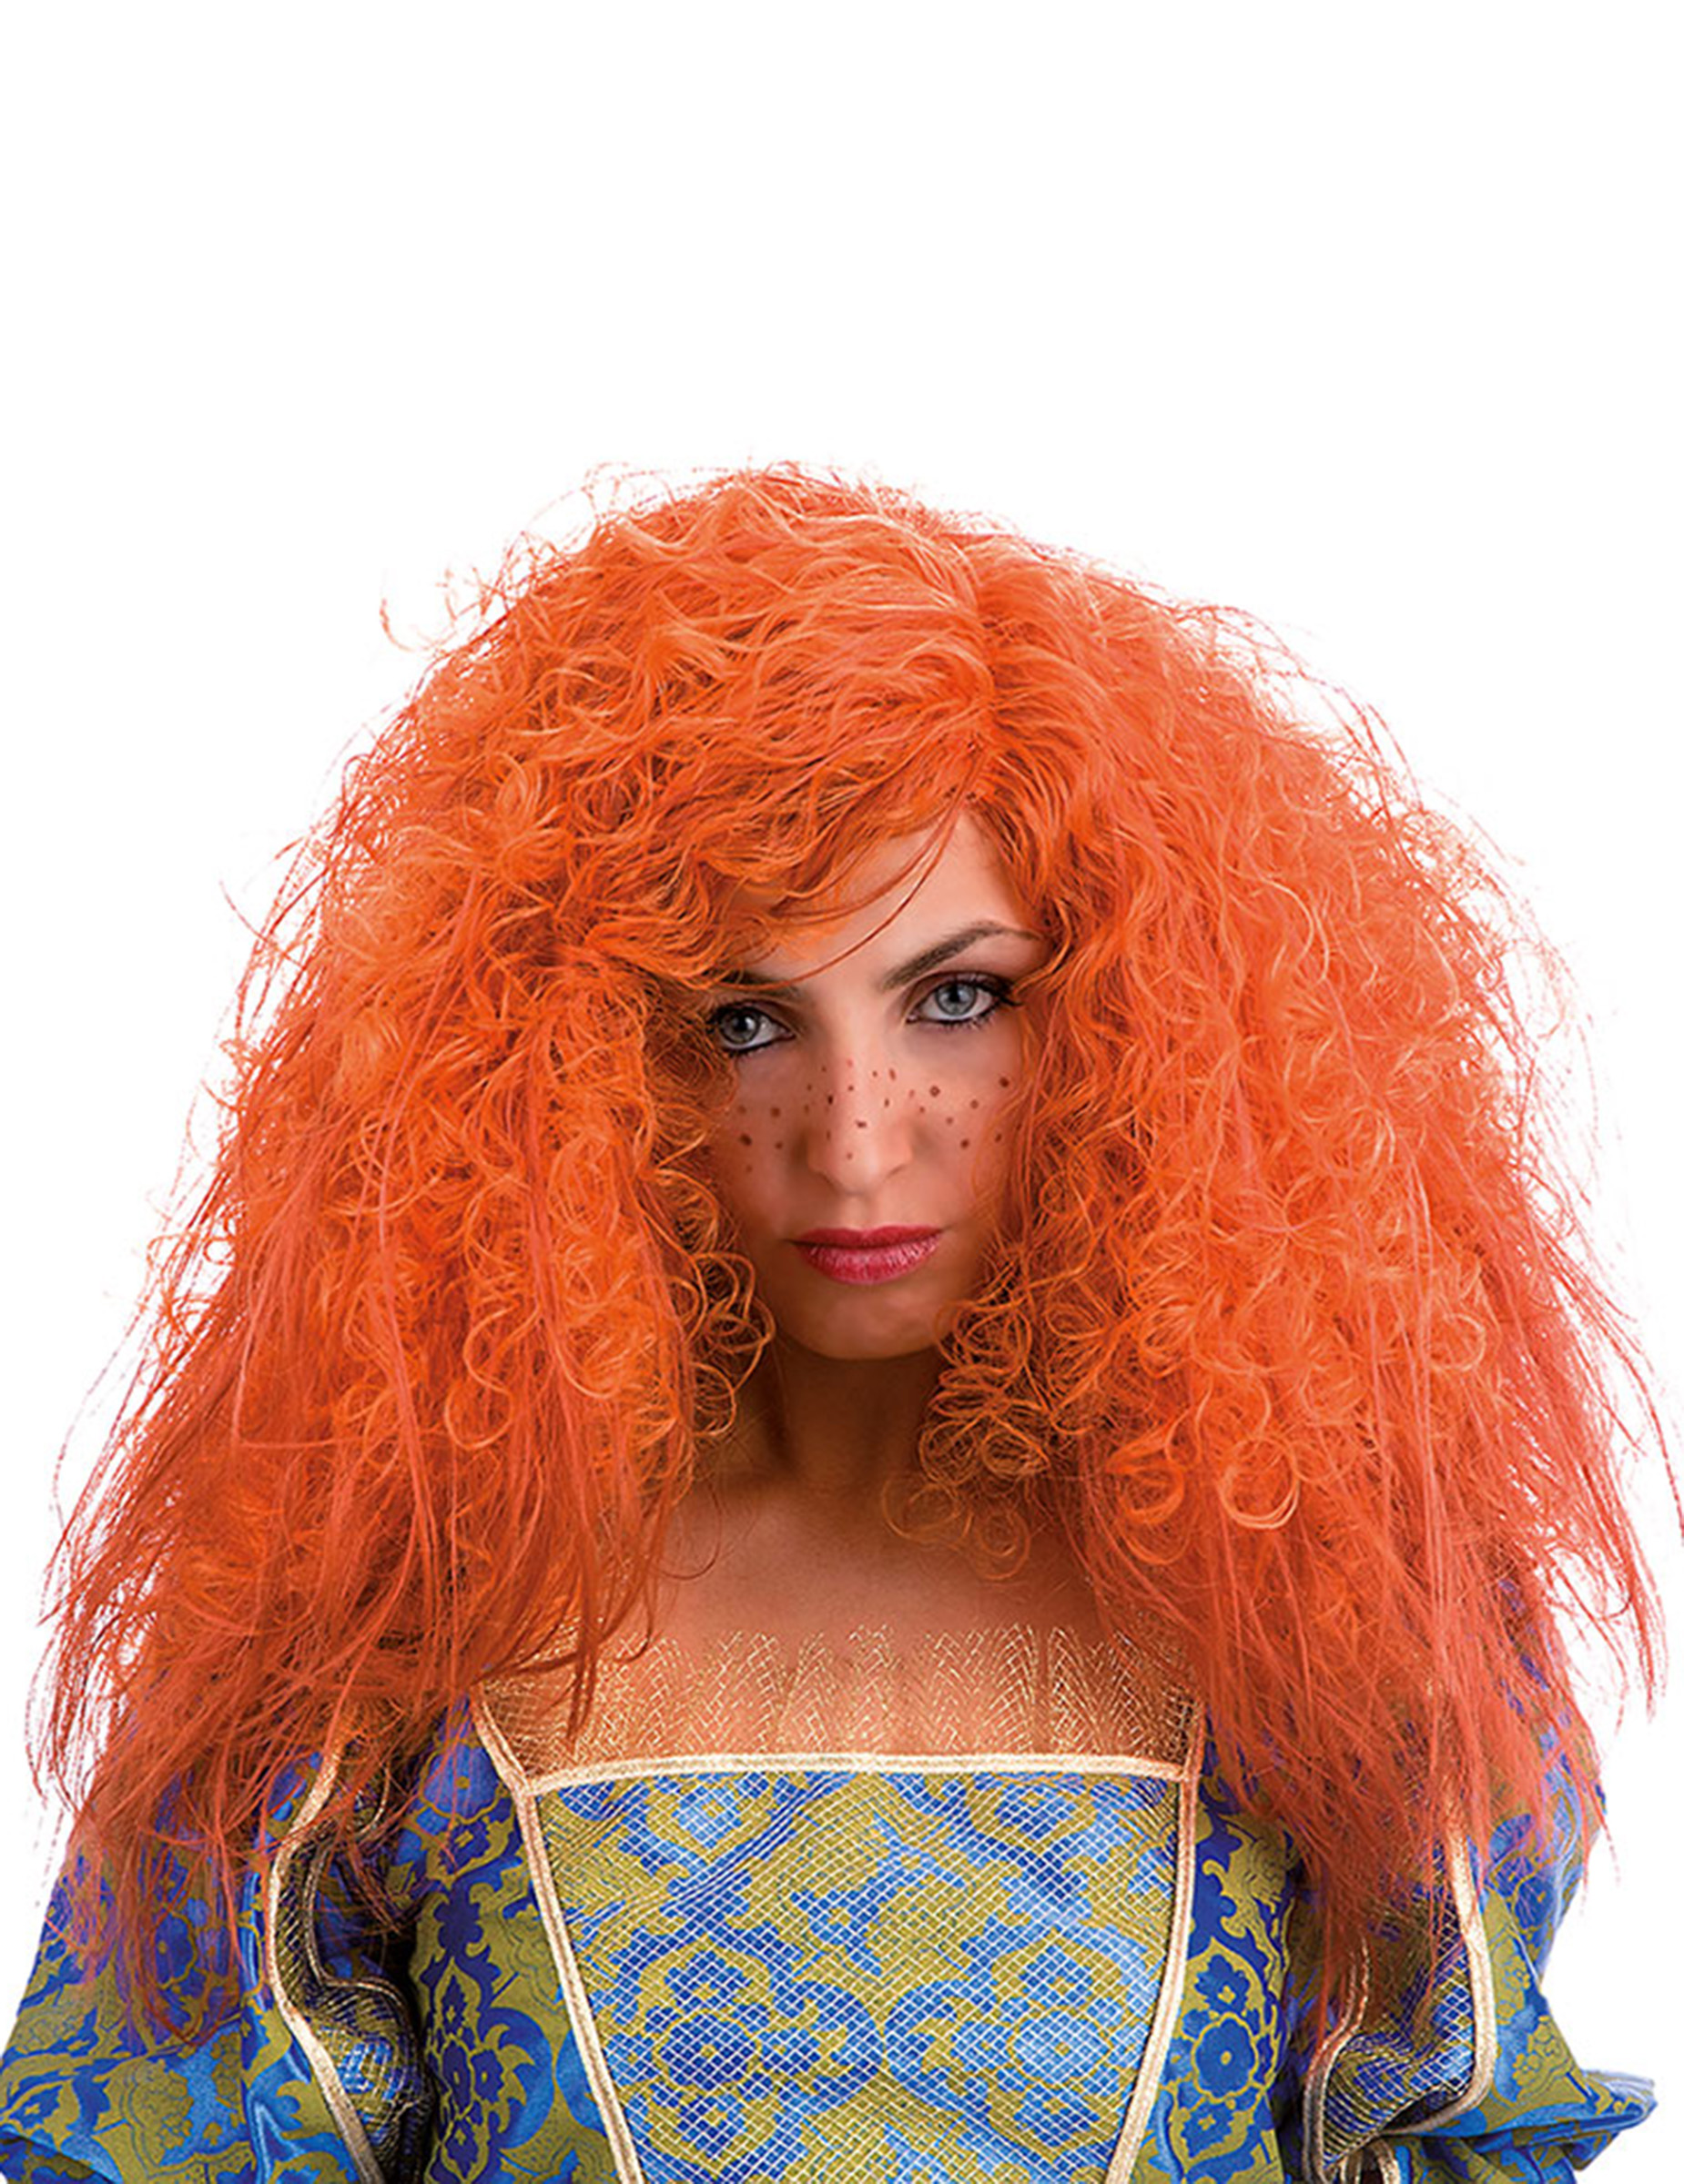 Orangefarbene Perücke mit krisseligem Haar 66377